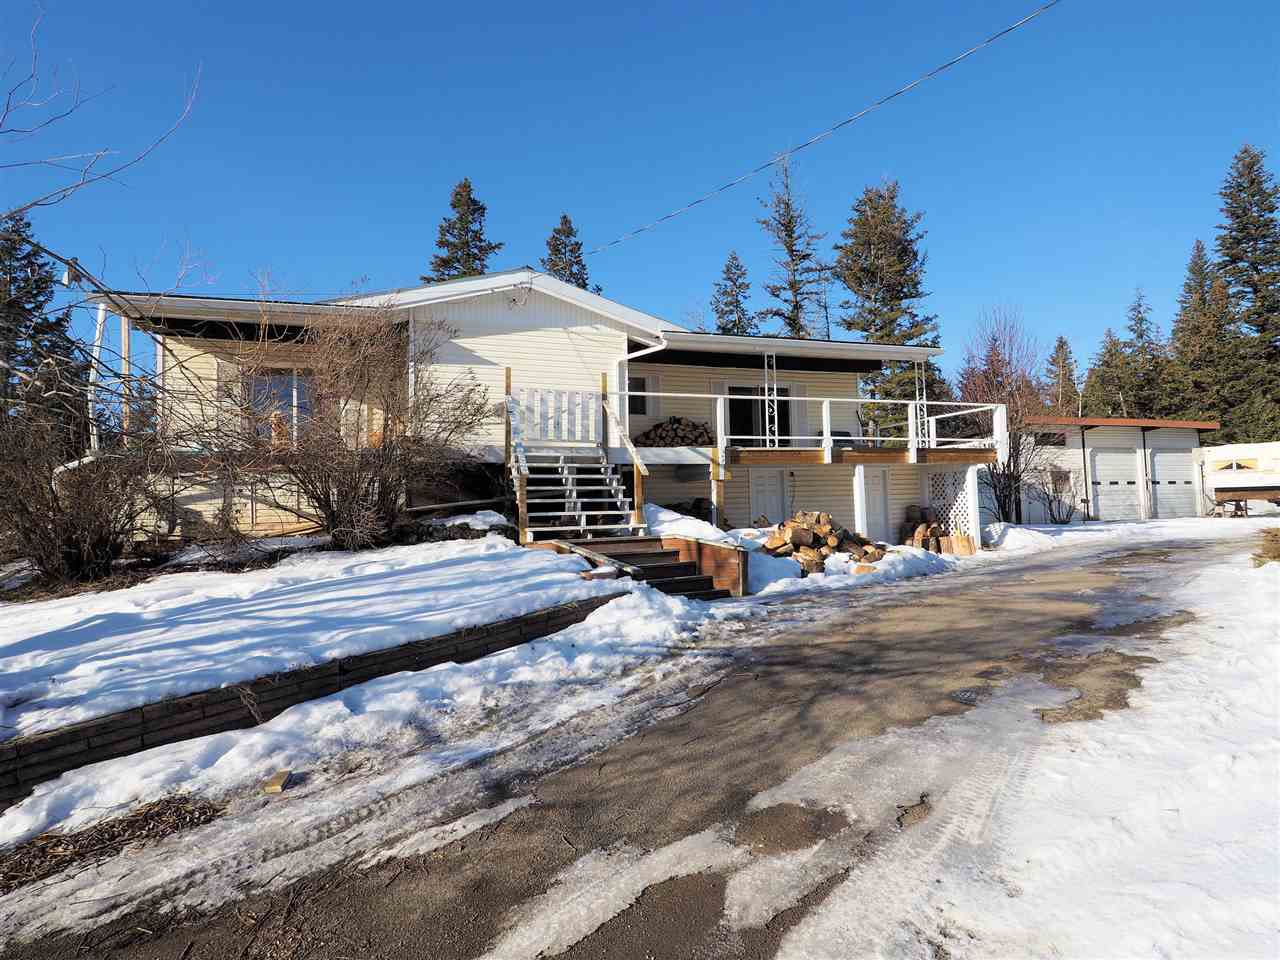 Main Photo: 5717 HORSE LAKE Road: Horse Lake House for sale (100 Mile House (Zone 10))  : MLS®# R2334431